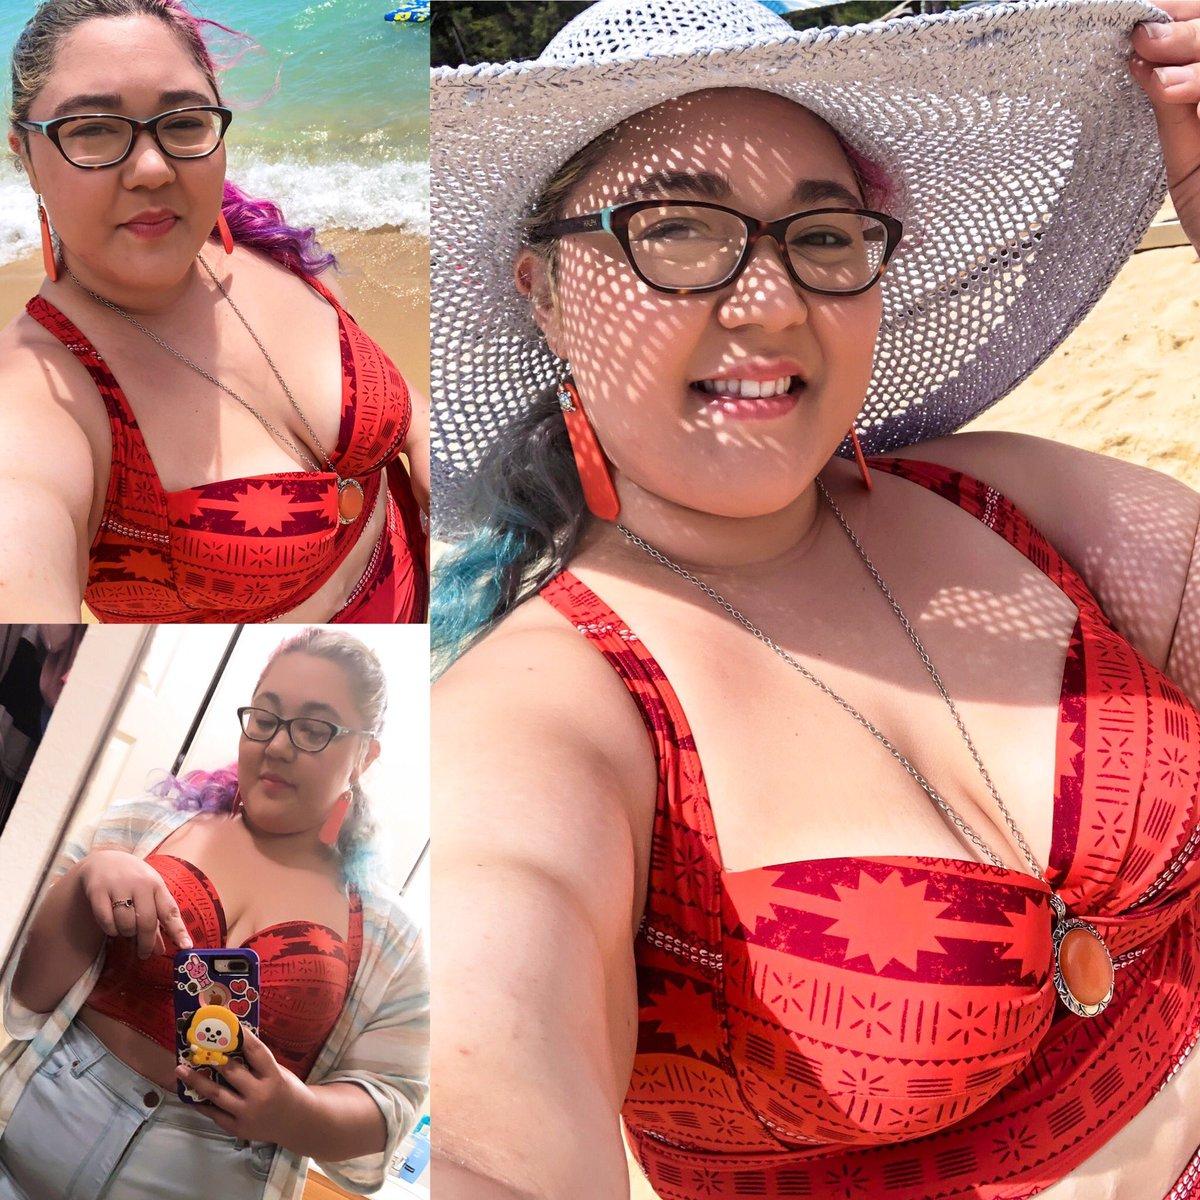 Beach 🏖 day kind of day ❤️ #hawaii #hawaiilife #beach #beachlife #sunnyday #torrid #plussizefashion #plussizegoddess #curvesoncurves #LoveMyself #loveyourself